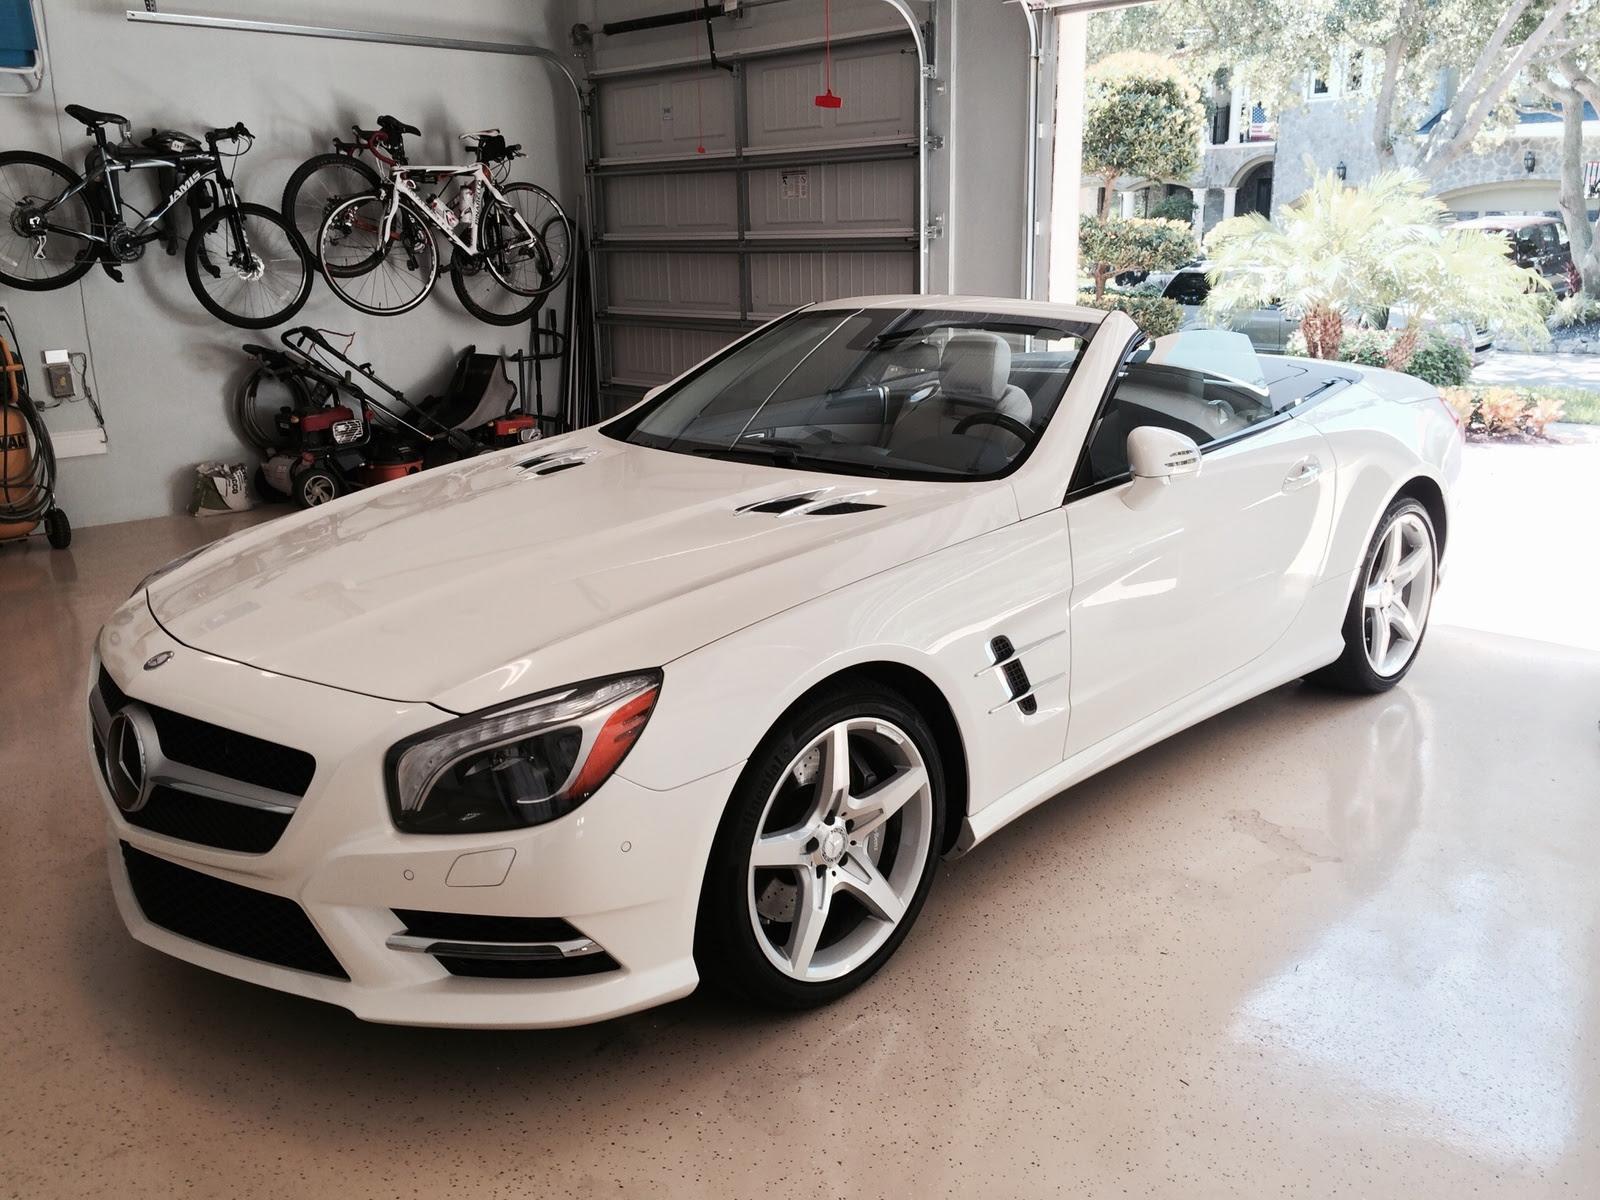 New 2015 Mercedes-Benz SL-Class For Sale - CarGurus